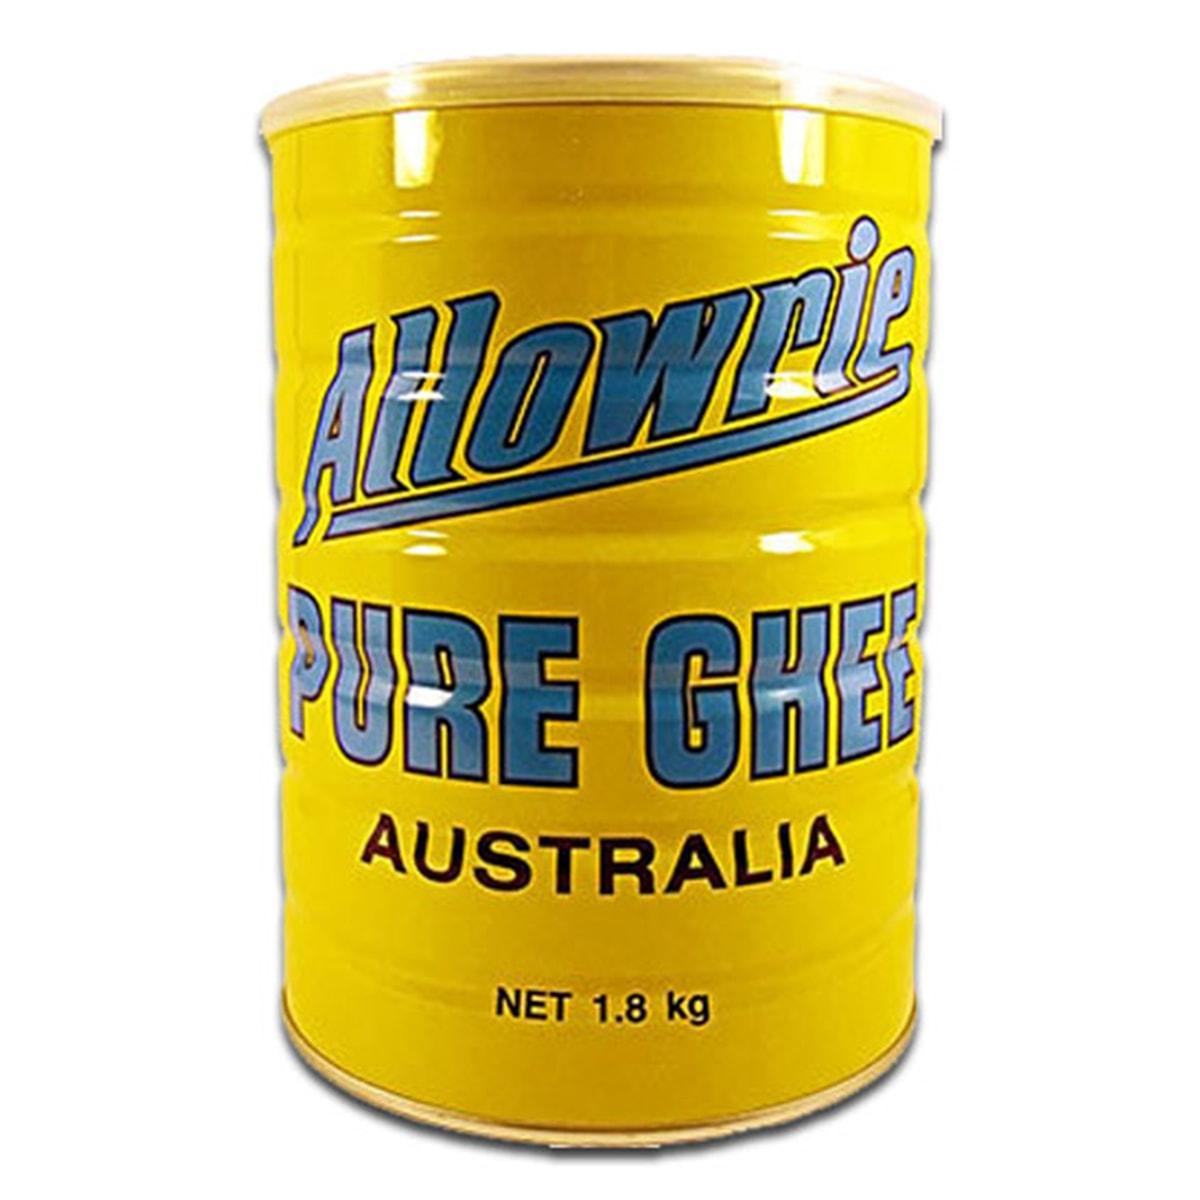 Buy Allowrie Pure Ghee (Clarified Butter) Australia - 1.8 kg